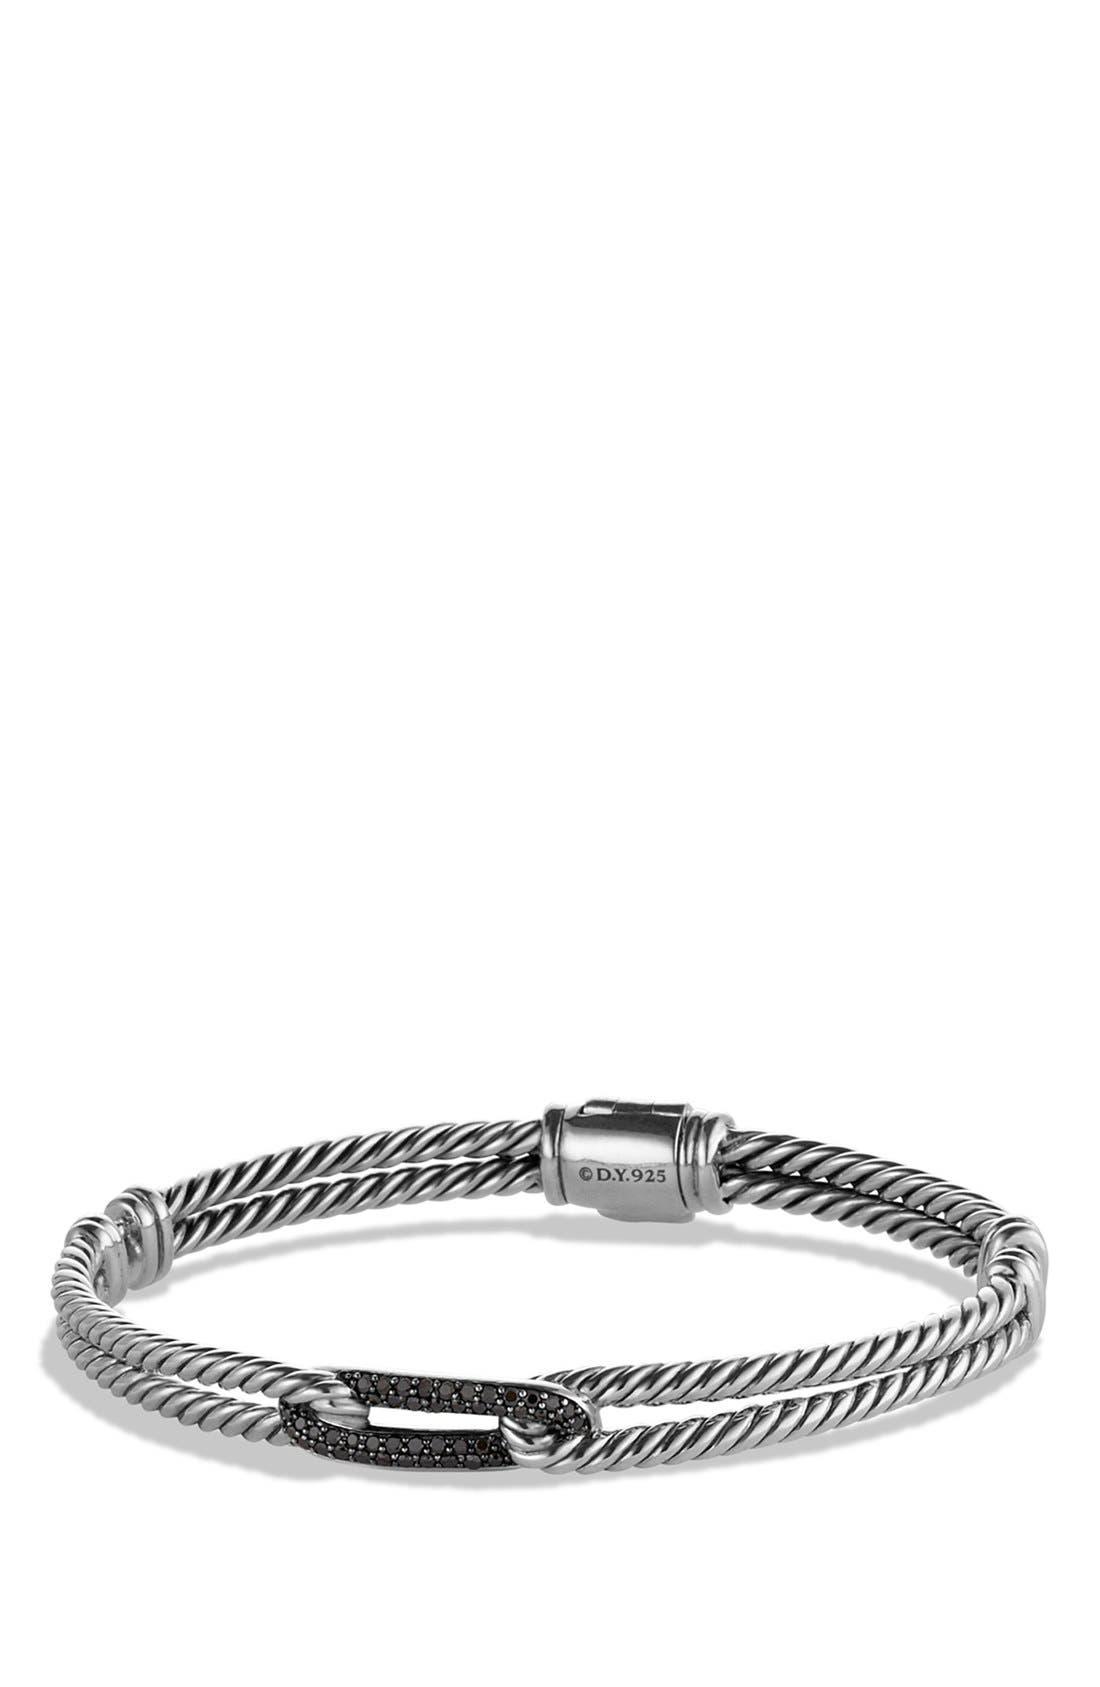 Main Image - David Yurman Petite Pavé 'Labyrinth' Mini Single Loop Bracelet with Diamonds in Gold